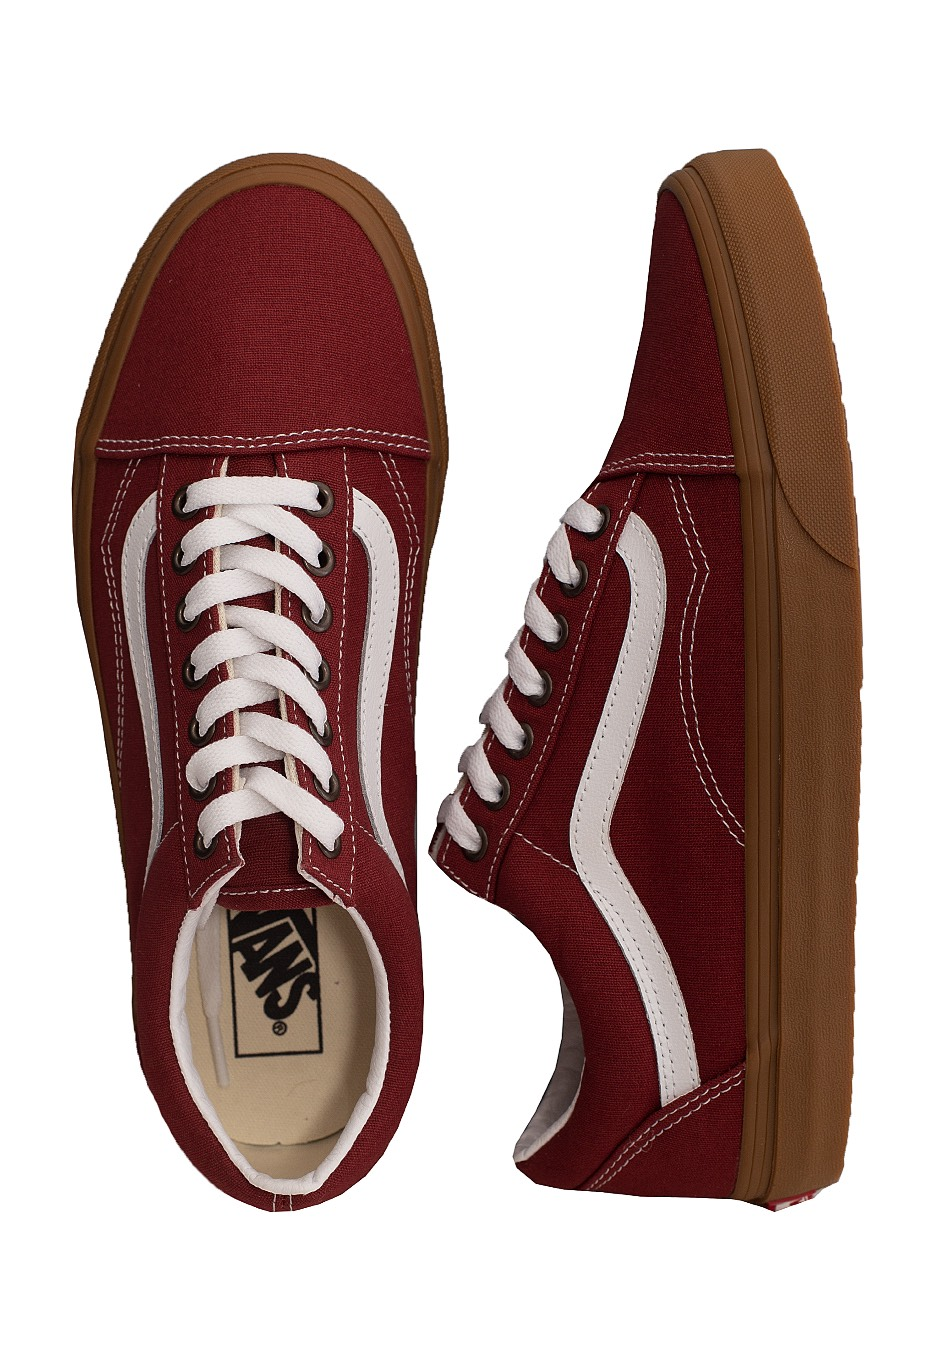 Vans Old Skool Sneaker en Burgundy & True White   REVOLVE